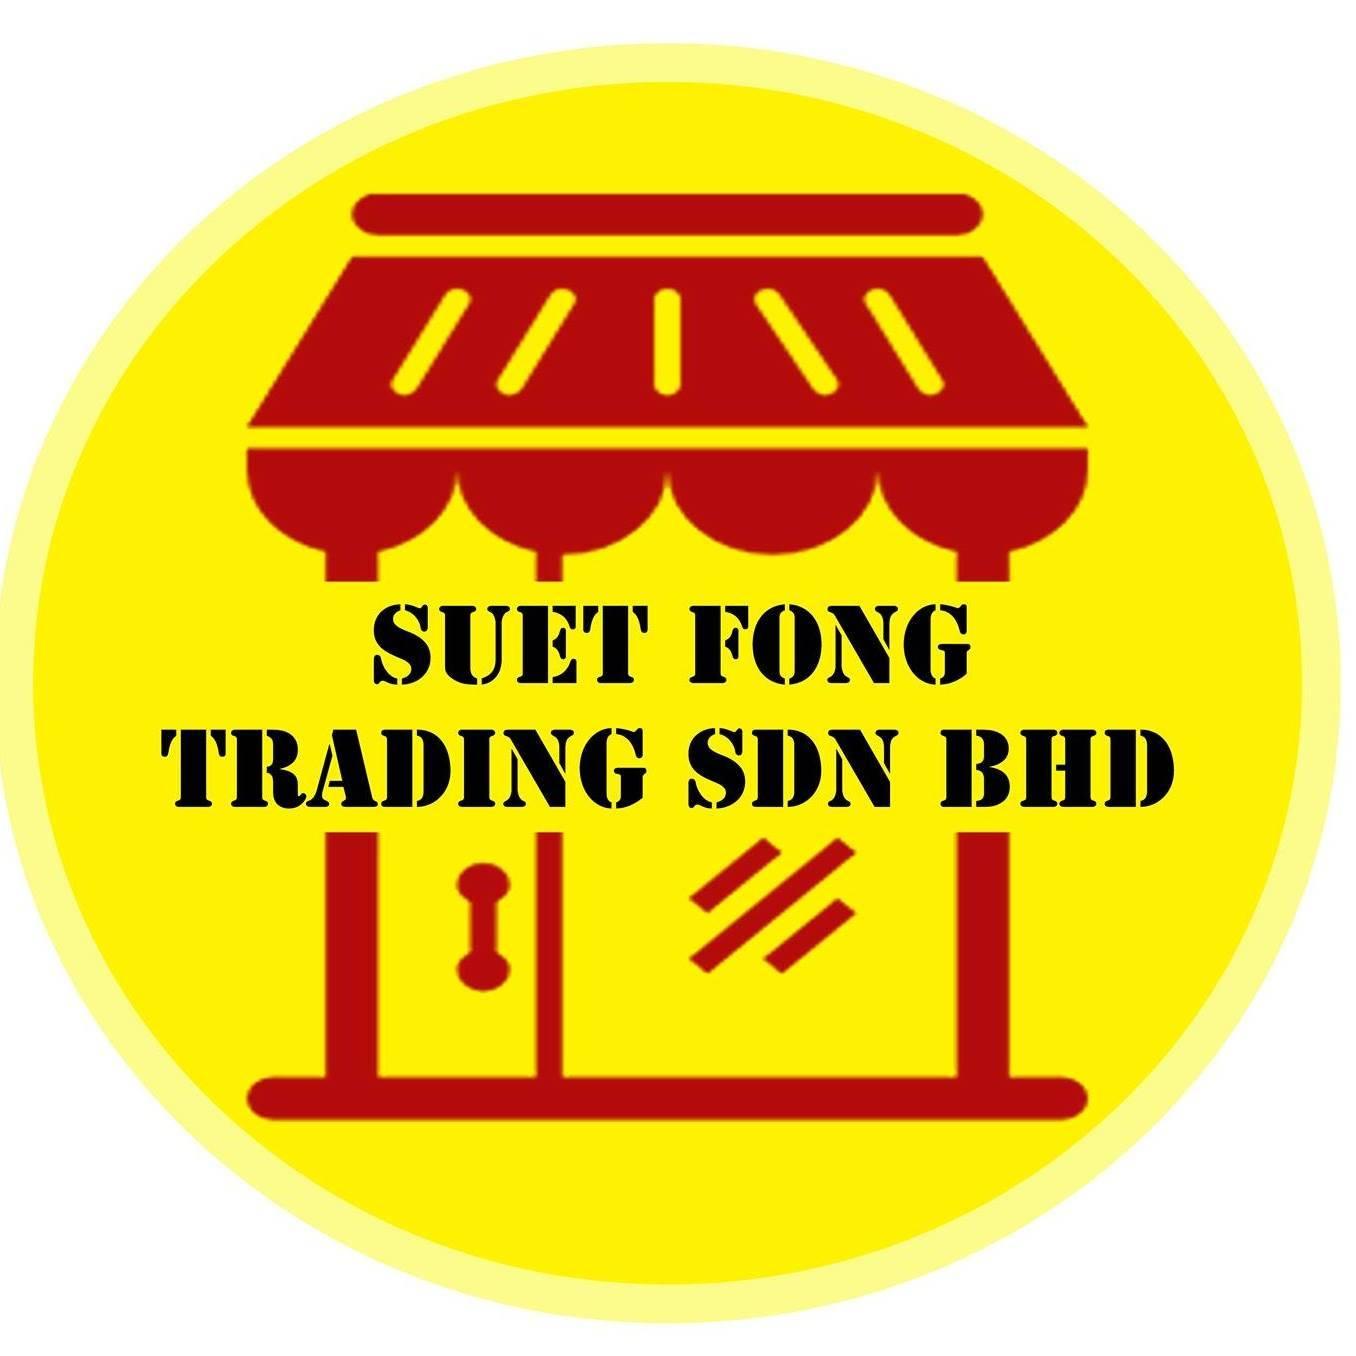 suet fong trading sdn bhd